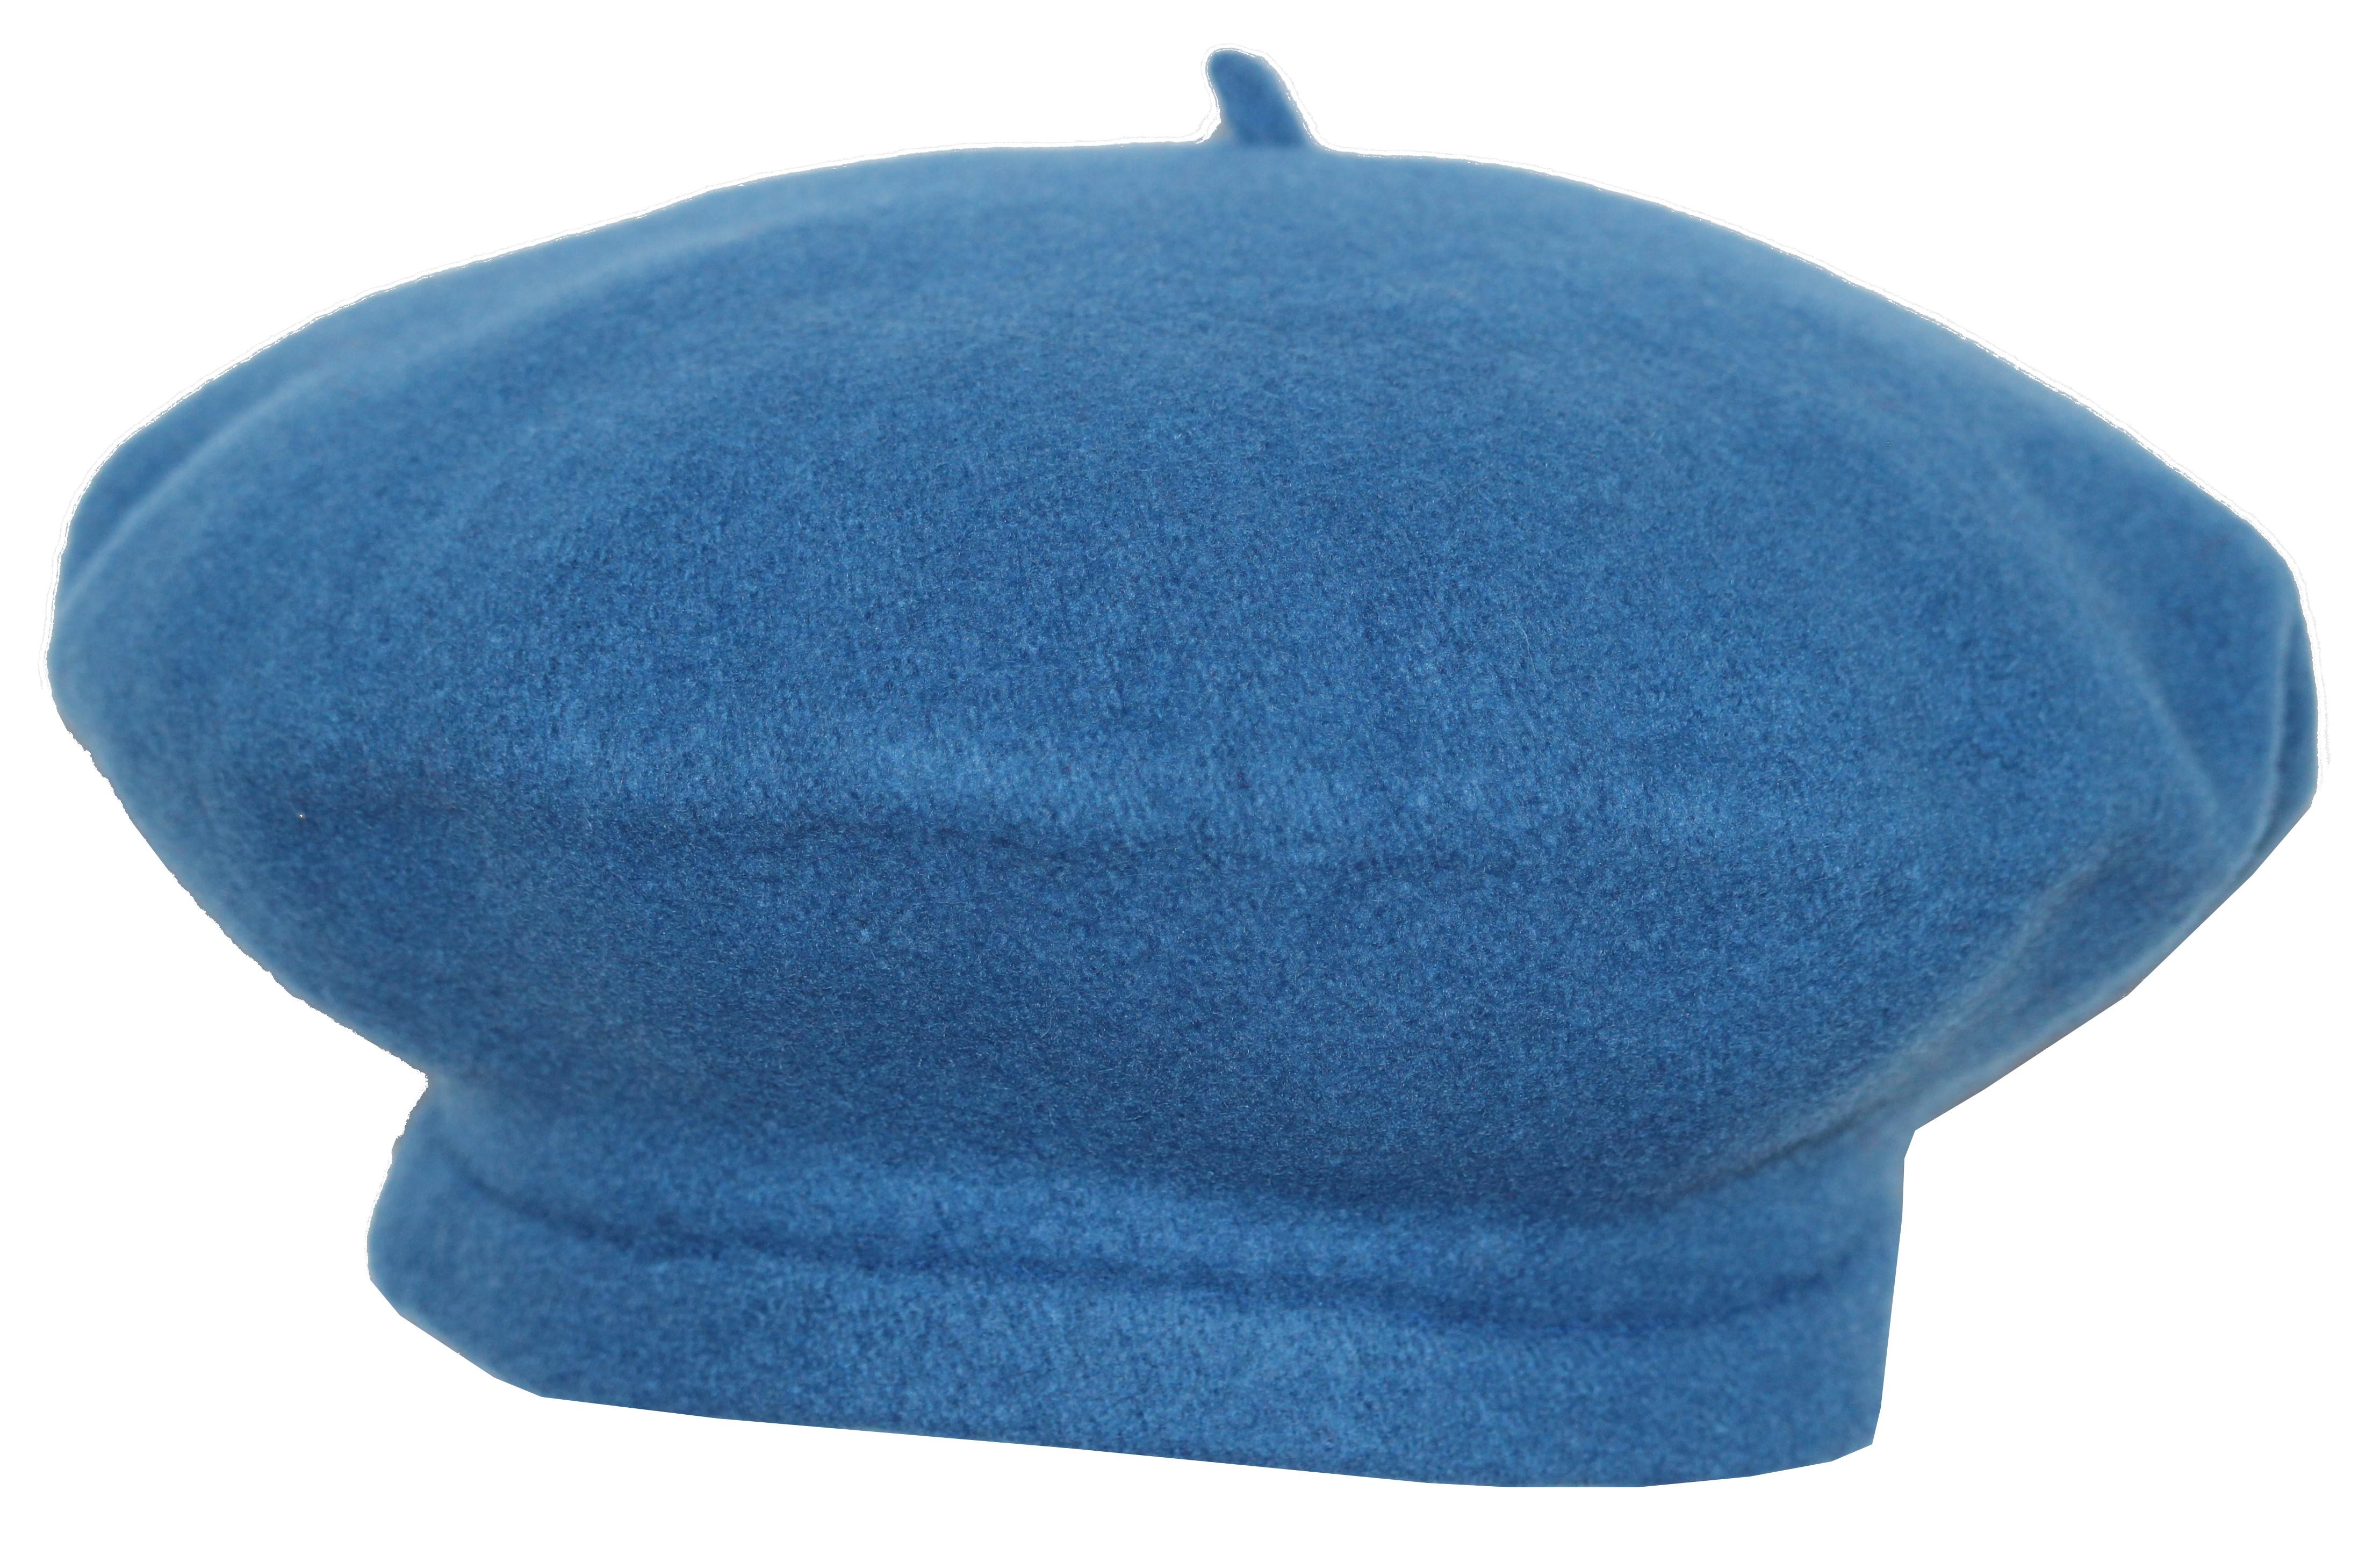 Béret 100% laine - flora super - bleu Bleu